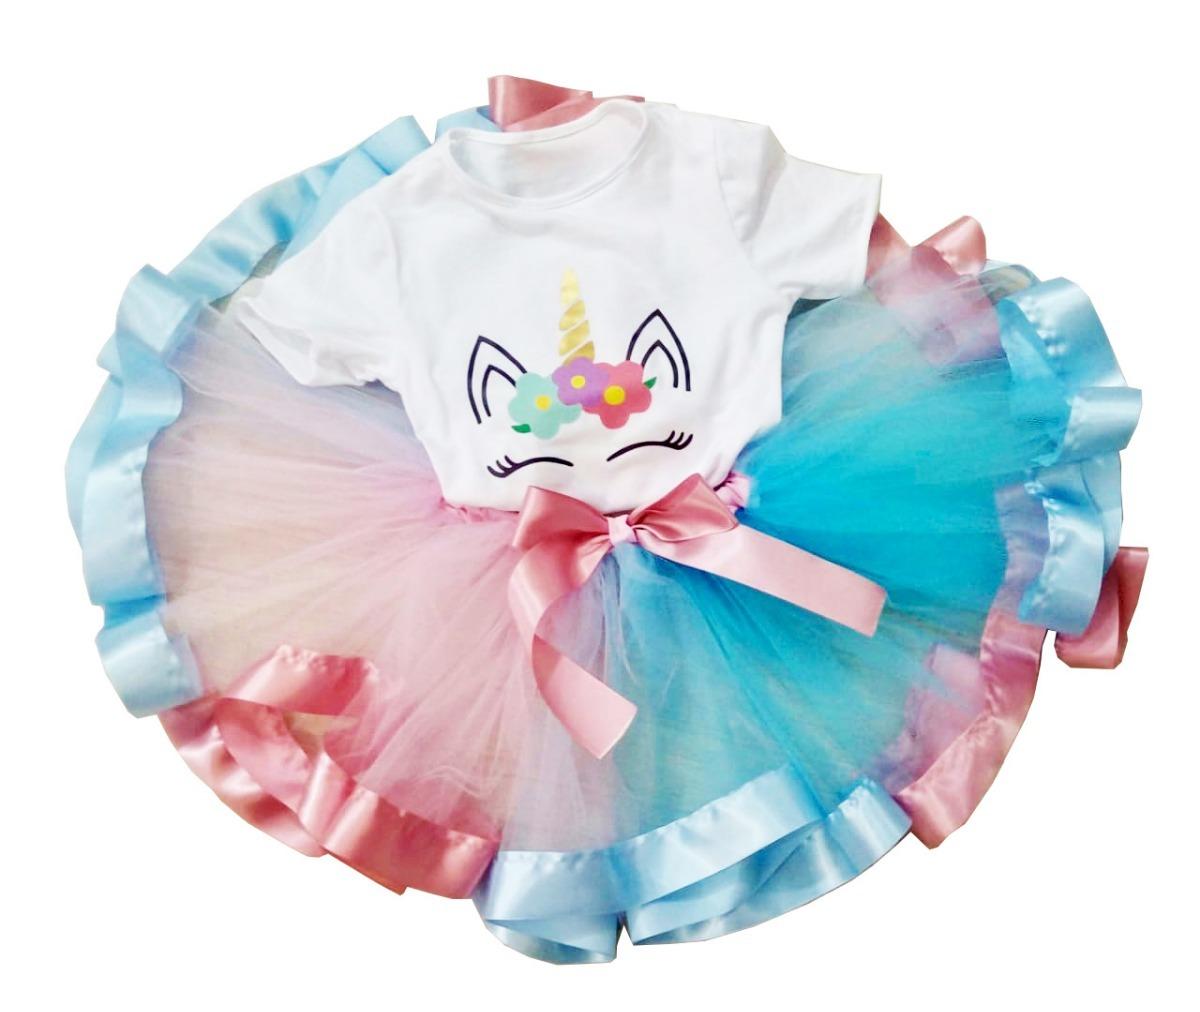 Saia Tutu Infantil Unicornio Cores Luxo Tule Fantasia Festa R 63